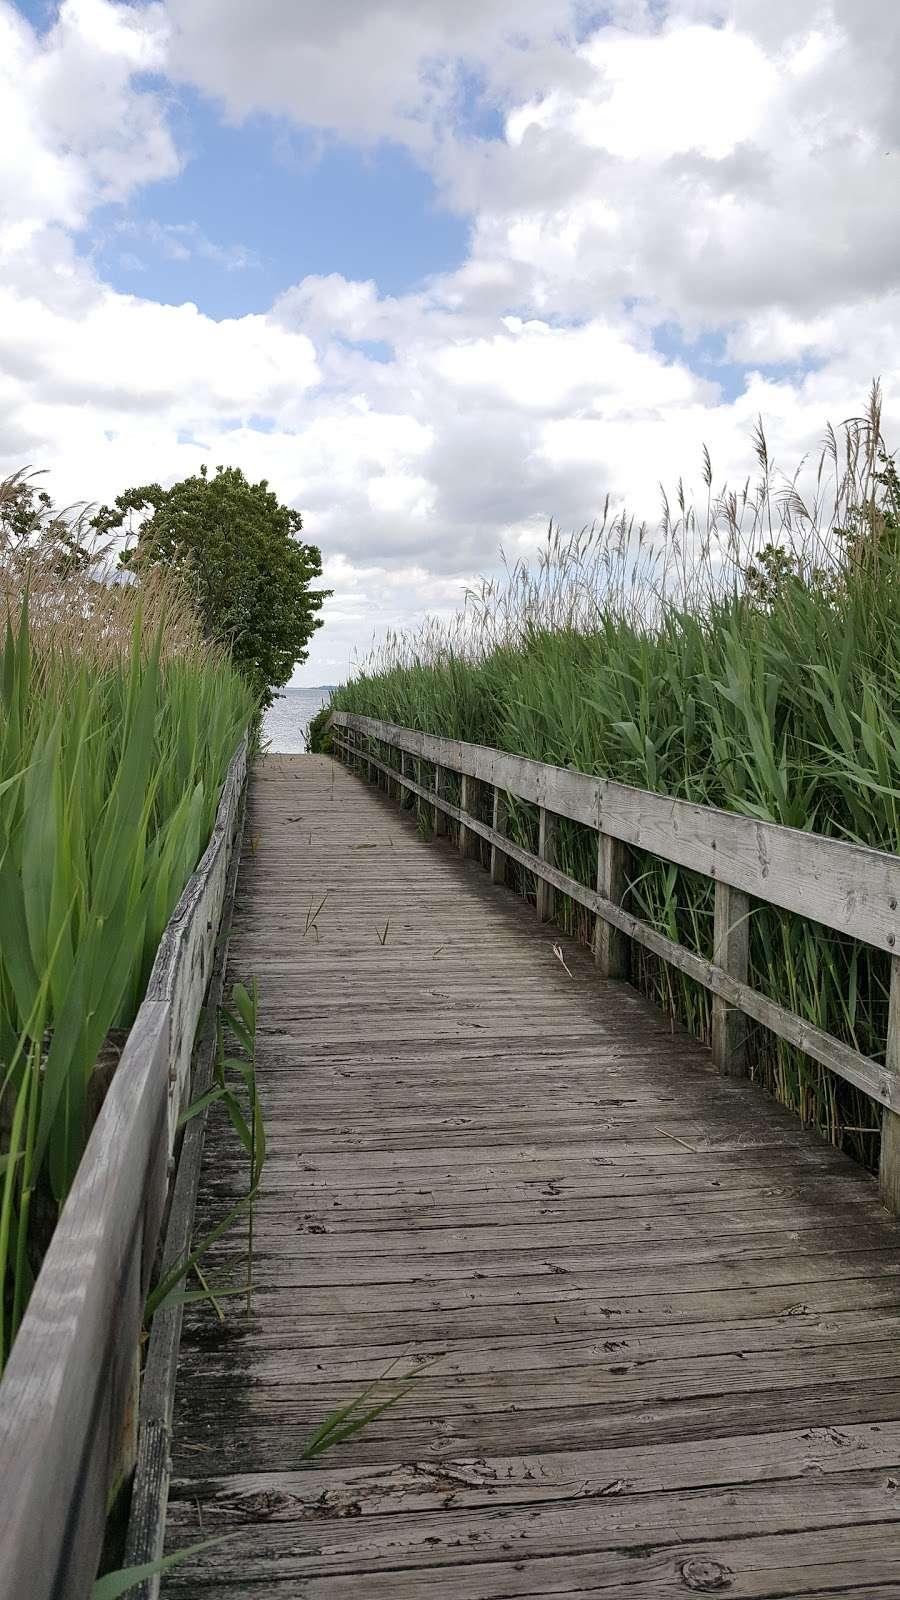 Miami Beach Park Maryland : miami, beach, maryland, Miami, Beach, Park,, Middle, River,, 21220,